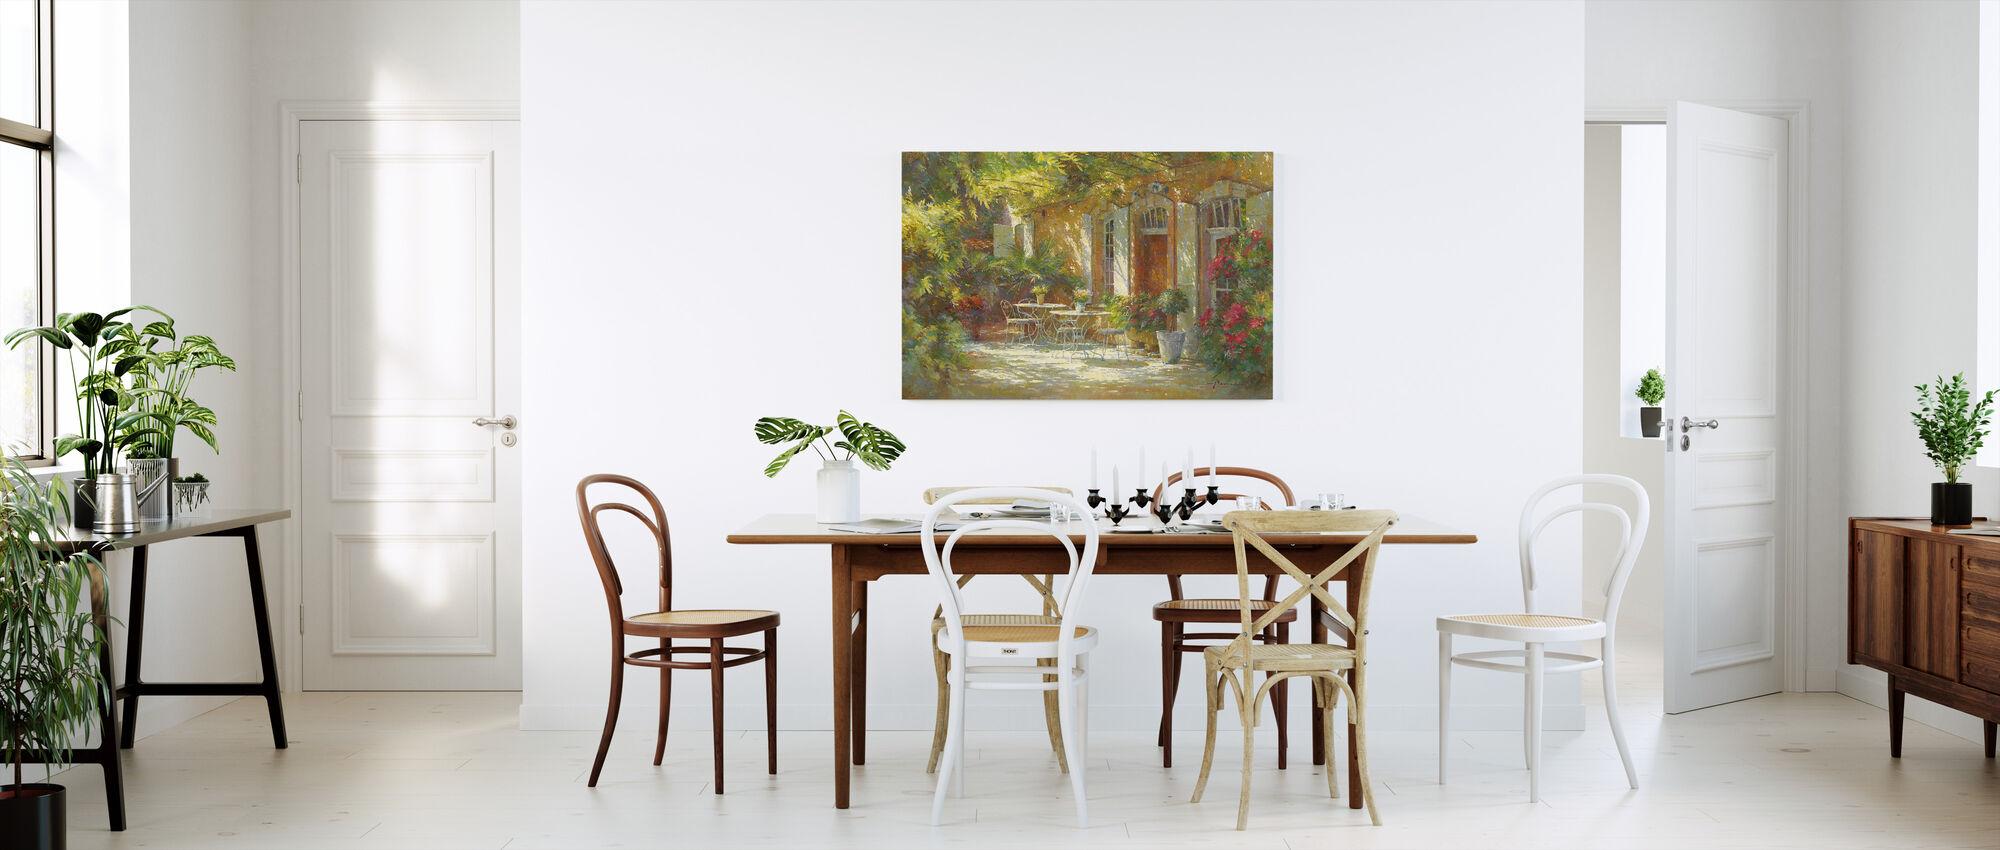 Det gamla inlägget Relais - Canvastavla - Kök